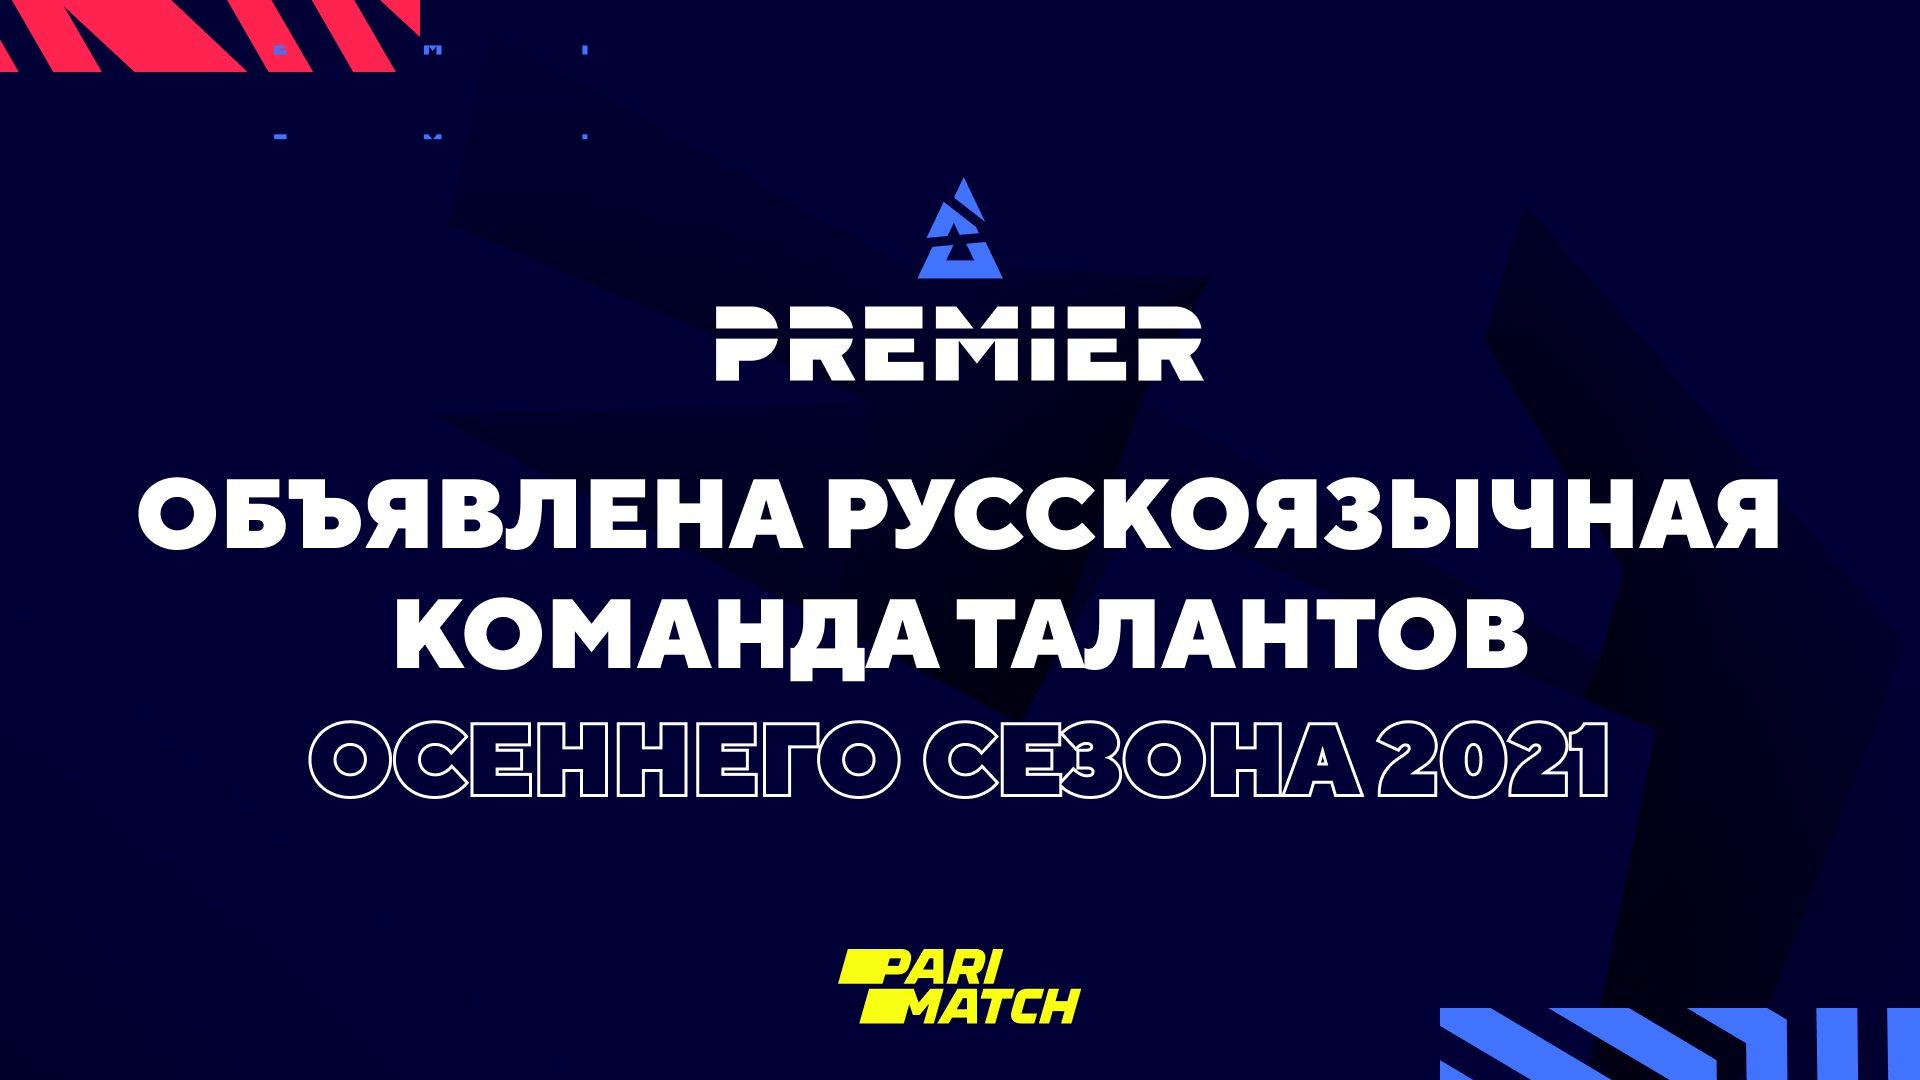 Объявлена русскоязычная команда талантов BLAST Premier: Fall Groups 2021. Изображение: WePlay Holding